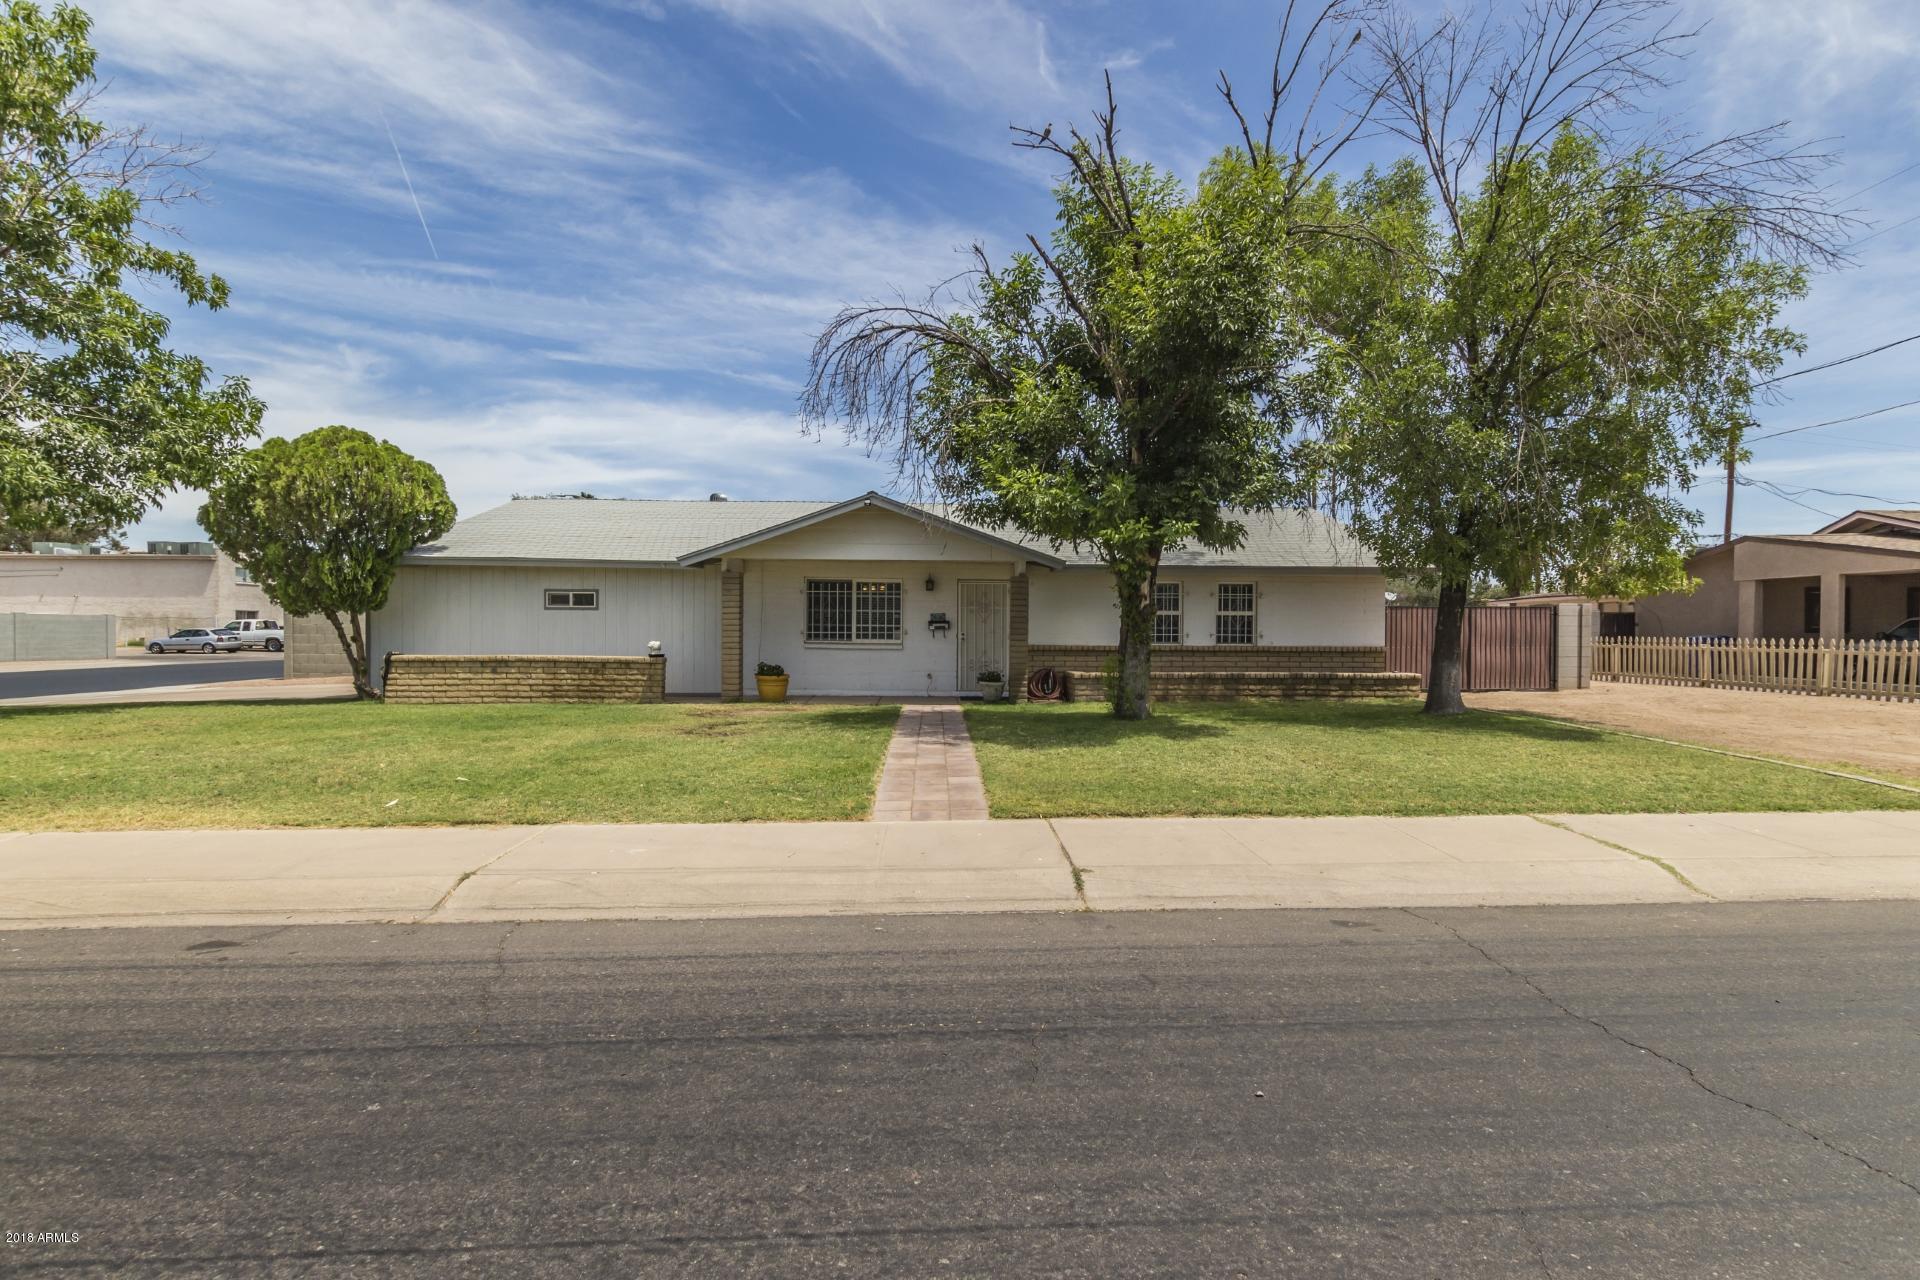 955 N JAY Street Chandler AZ 85225